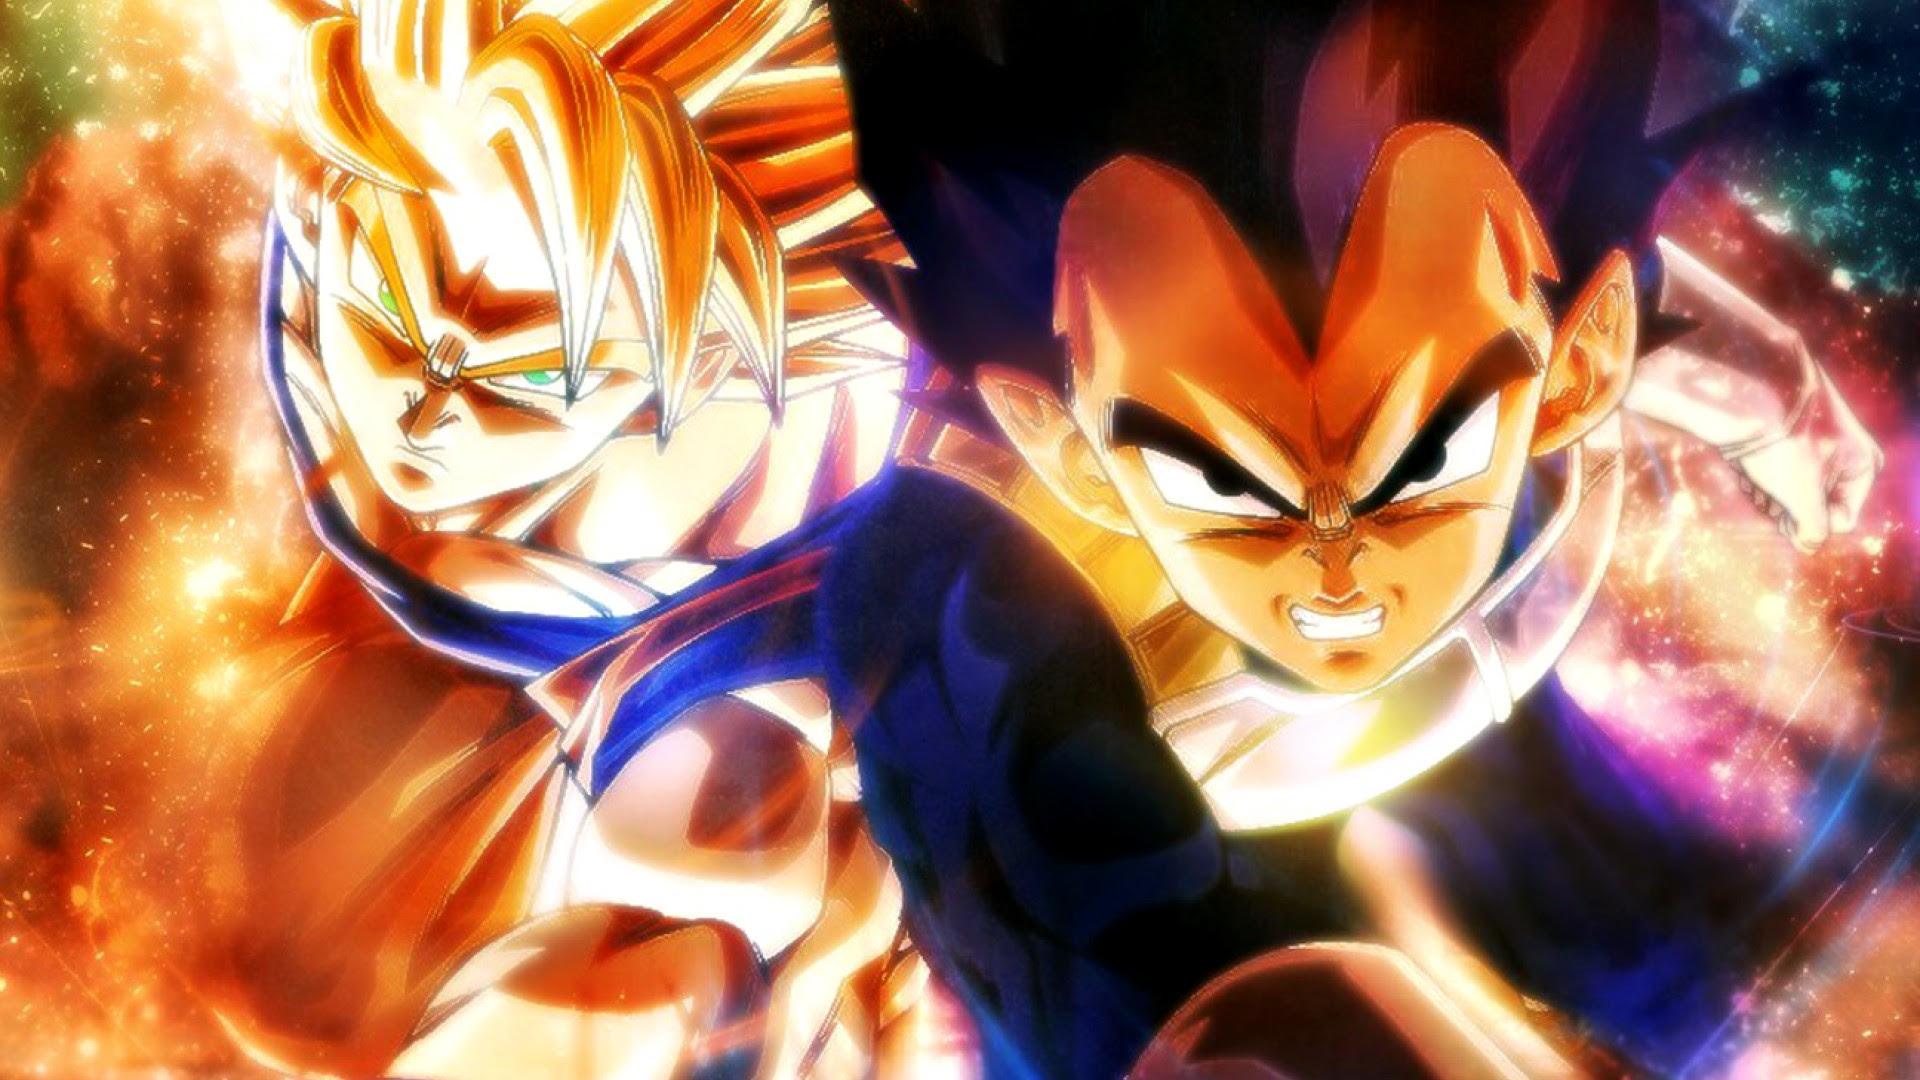 Dragon Ball Kid Goku Wallpaper Hd O Wallpaper Picture Photo 1920x1080